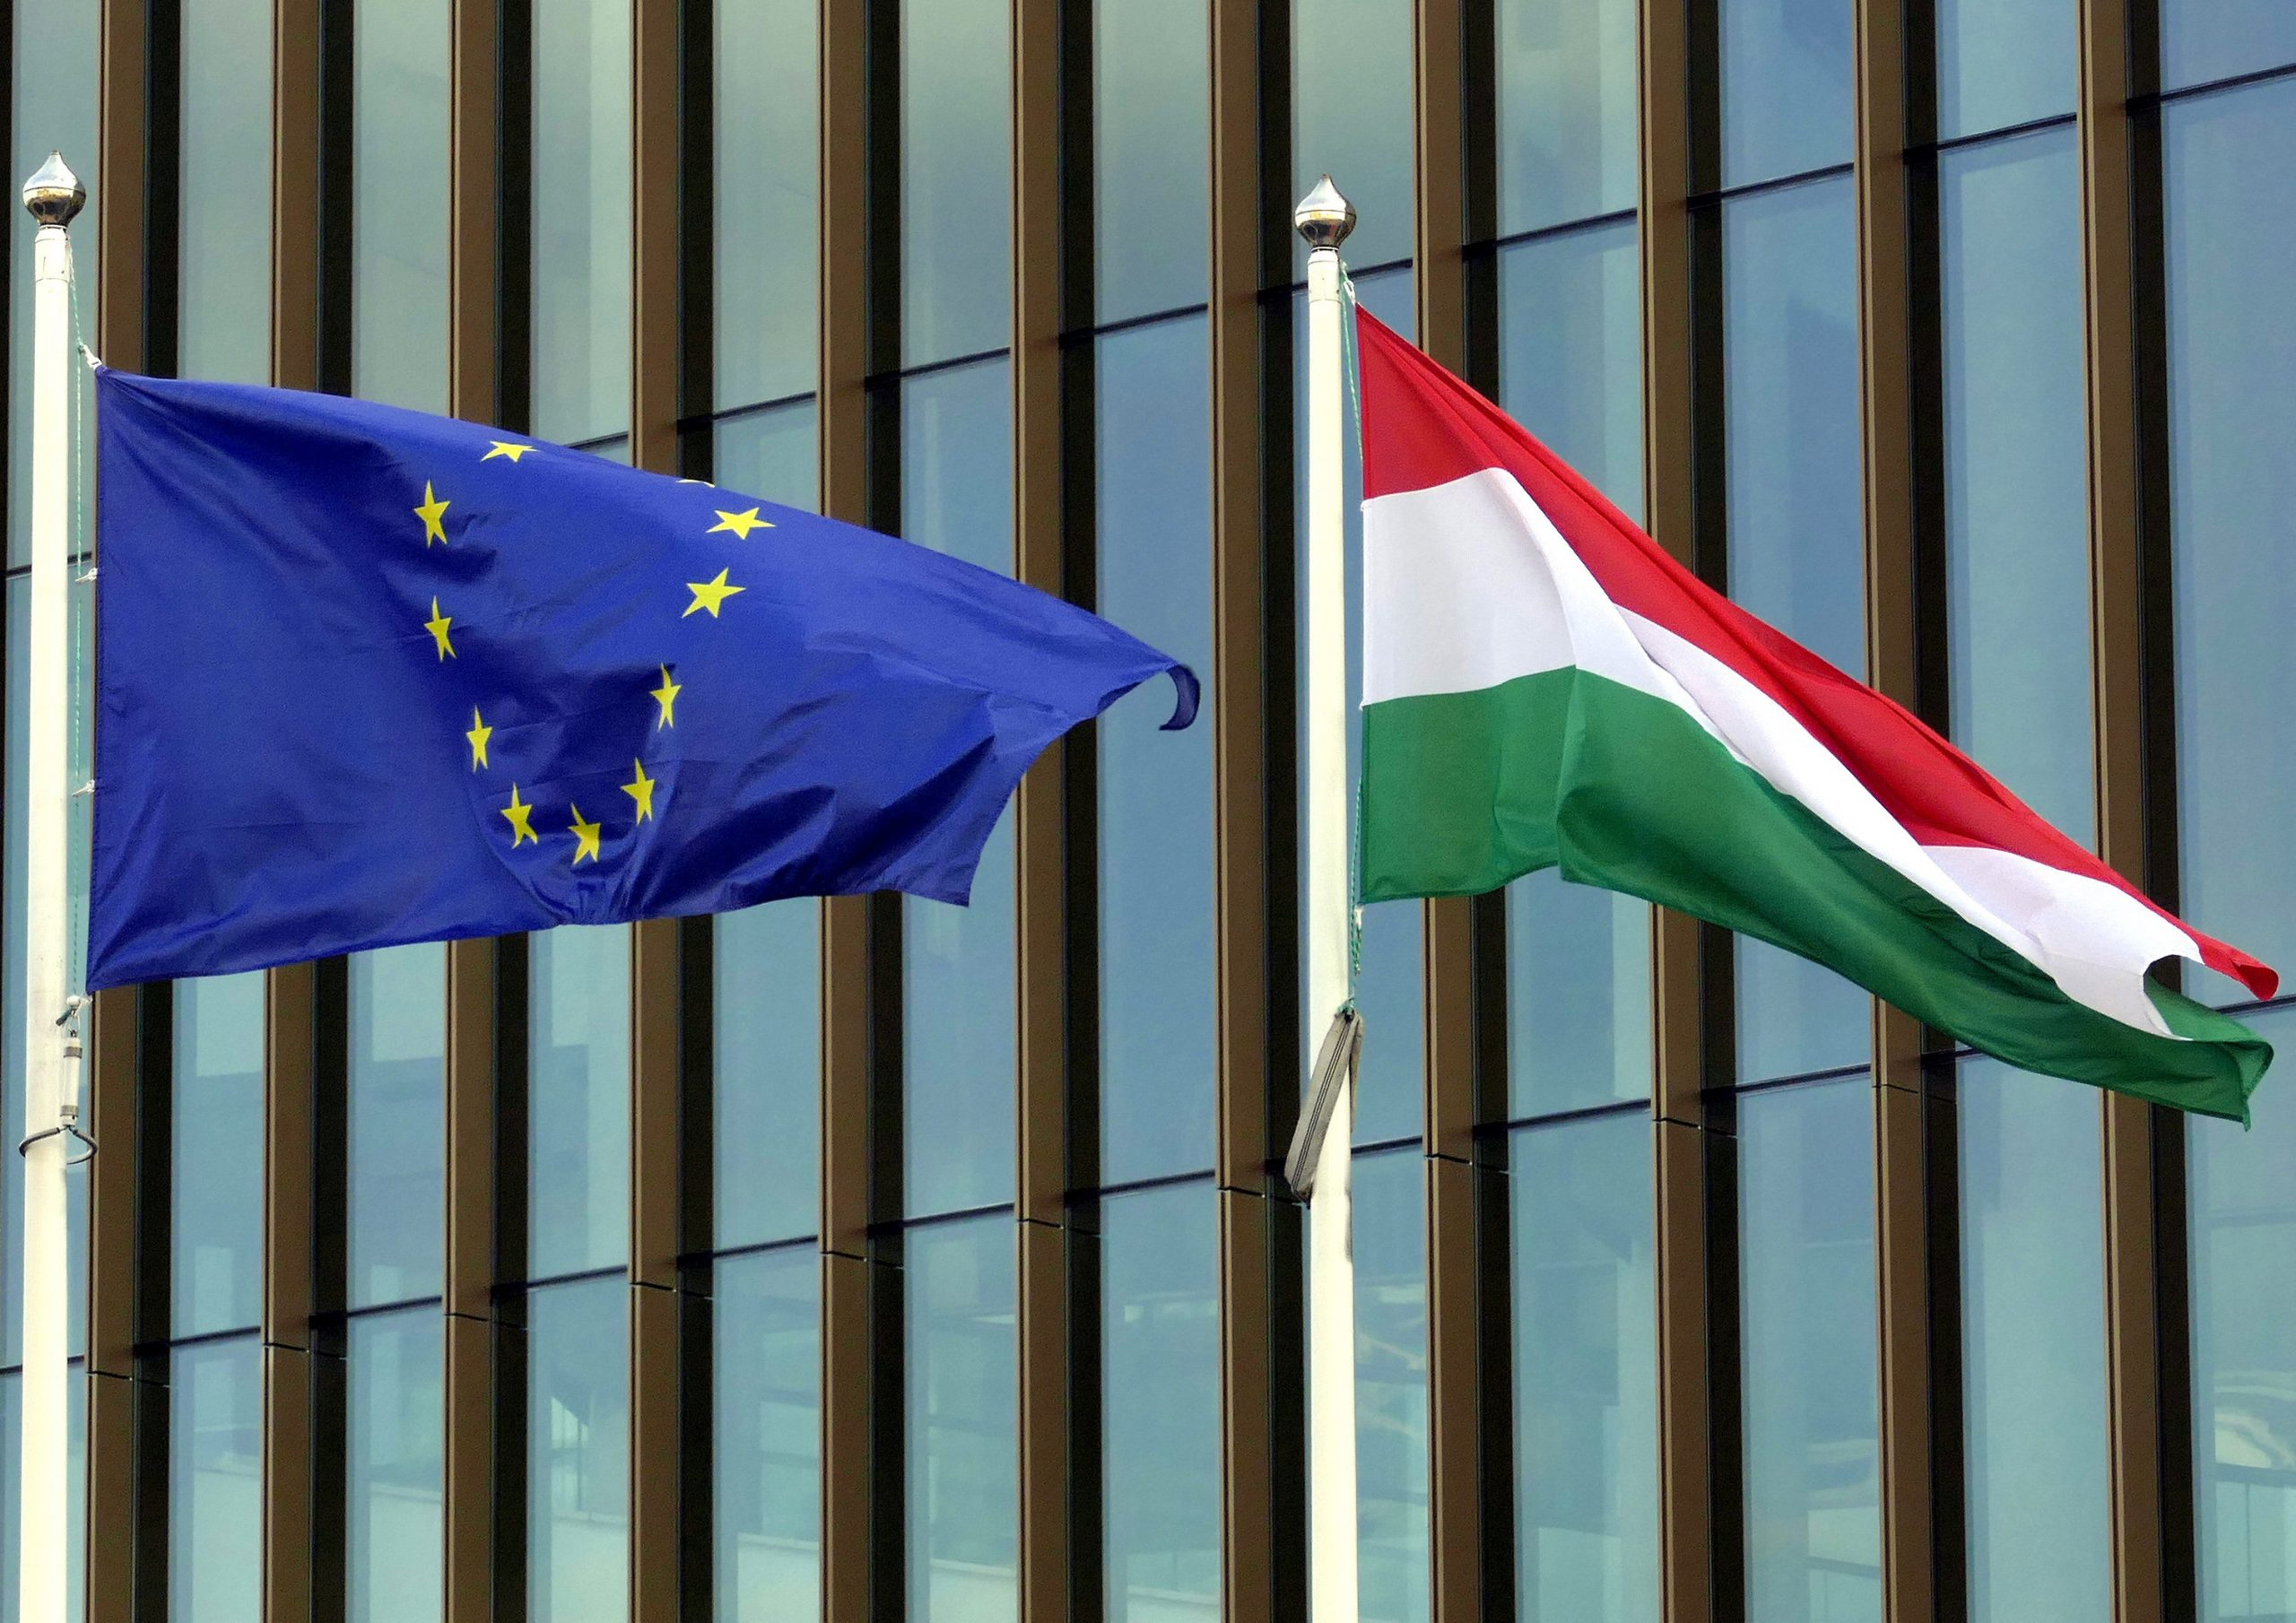 Record Support for Hungarian EU Membership, says Medián Survey